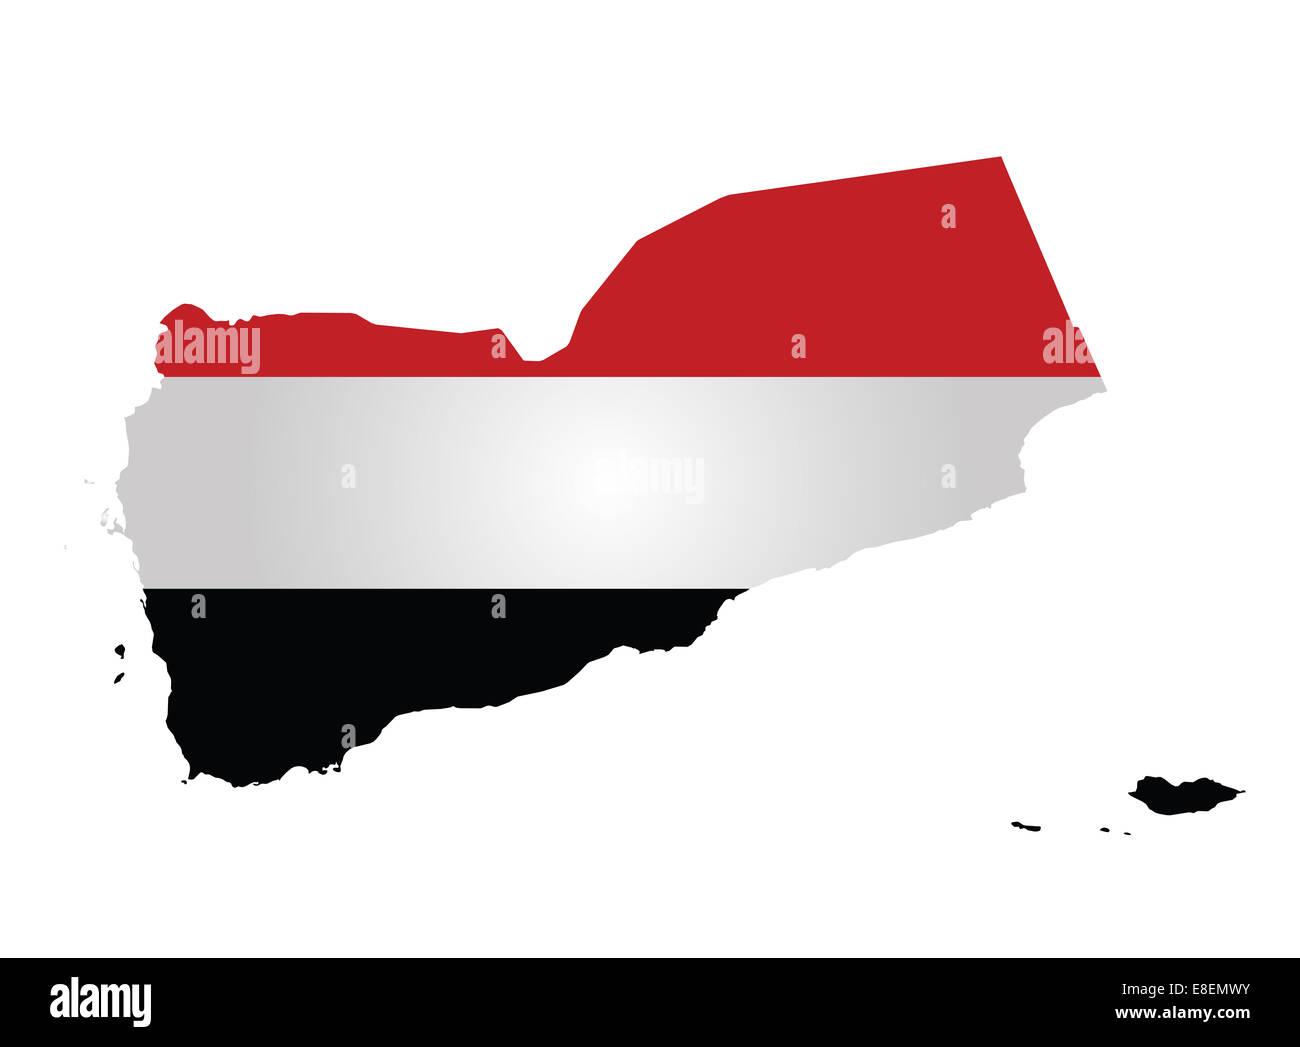 Flag of the Republic of Yemen - Stock Image